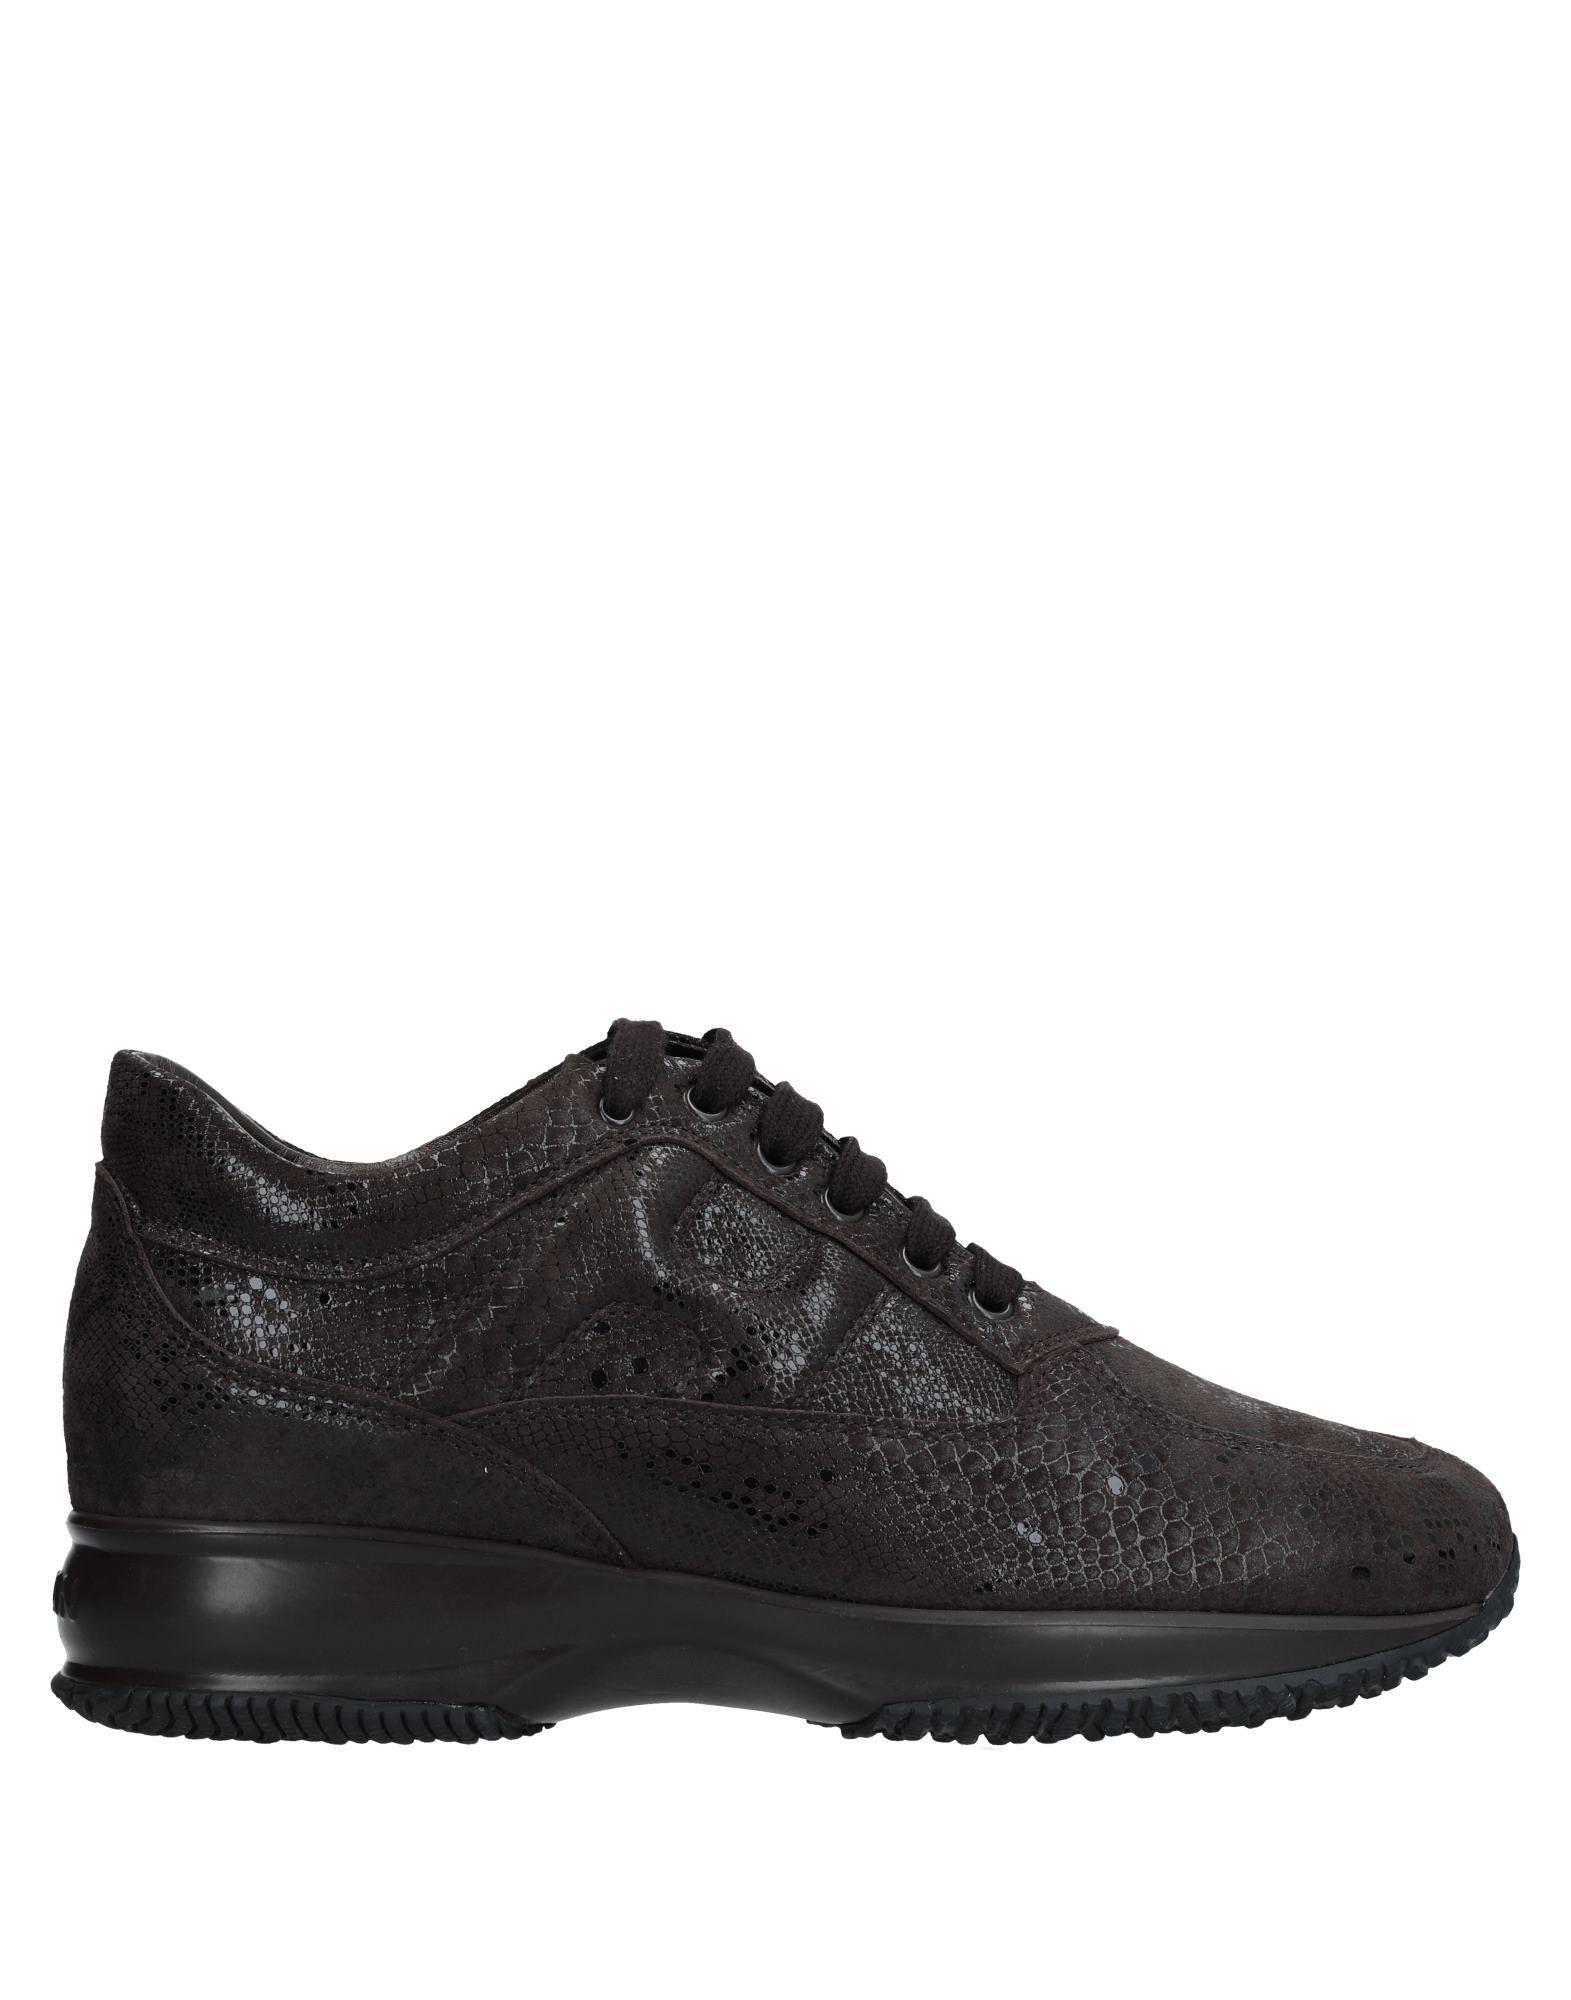 Hogan aussehende Sneakers Damen  11537941KVGut aussehende Hogan strapazierfähige Schuhe c7b153